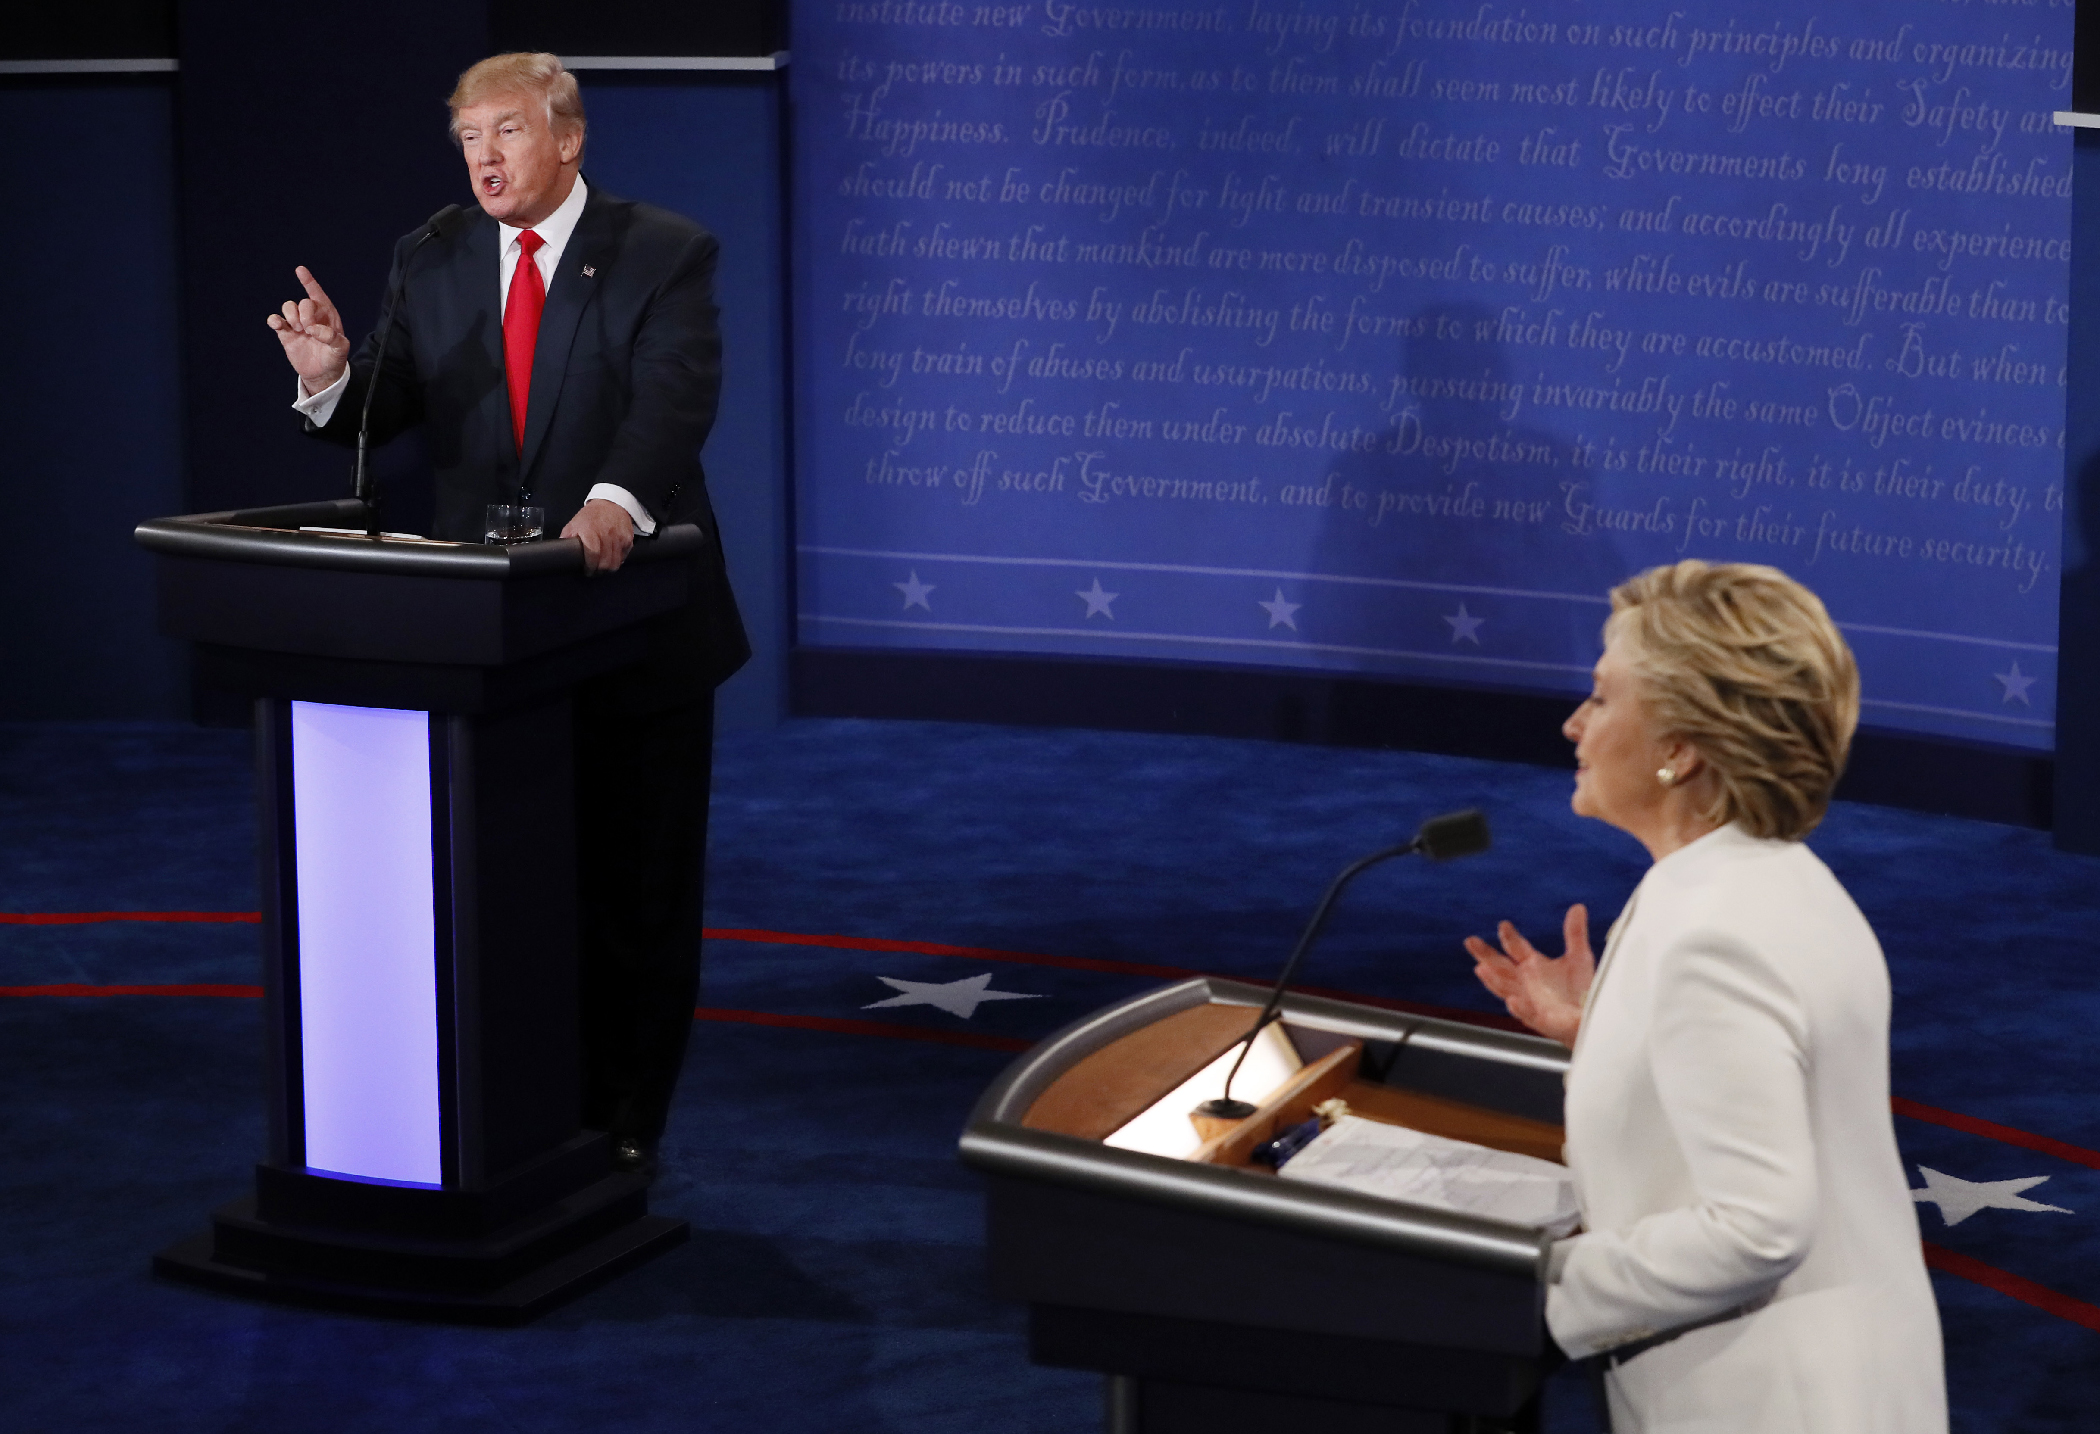 Republican presidential nominee Donald Trump debates with Democratic presidential nominee Hillary Clinton during the third presidential debate at UNLV in Las Vegas, Wednesday, Oct. 19, 2016.